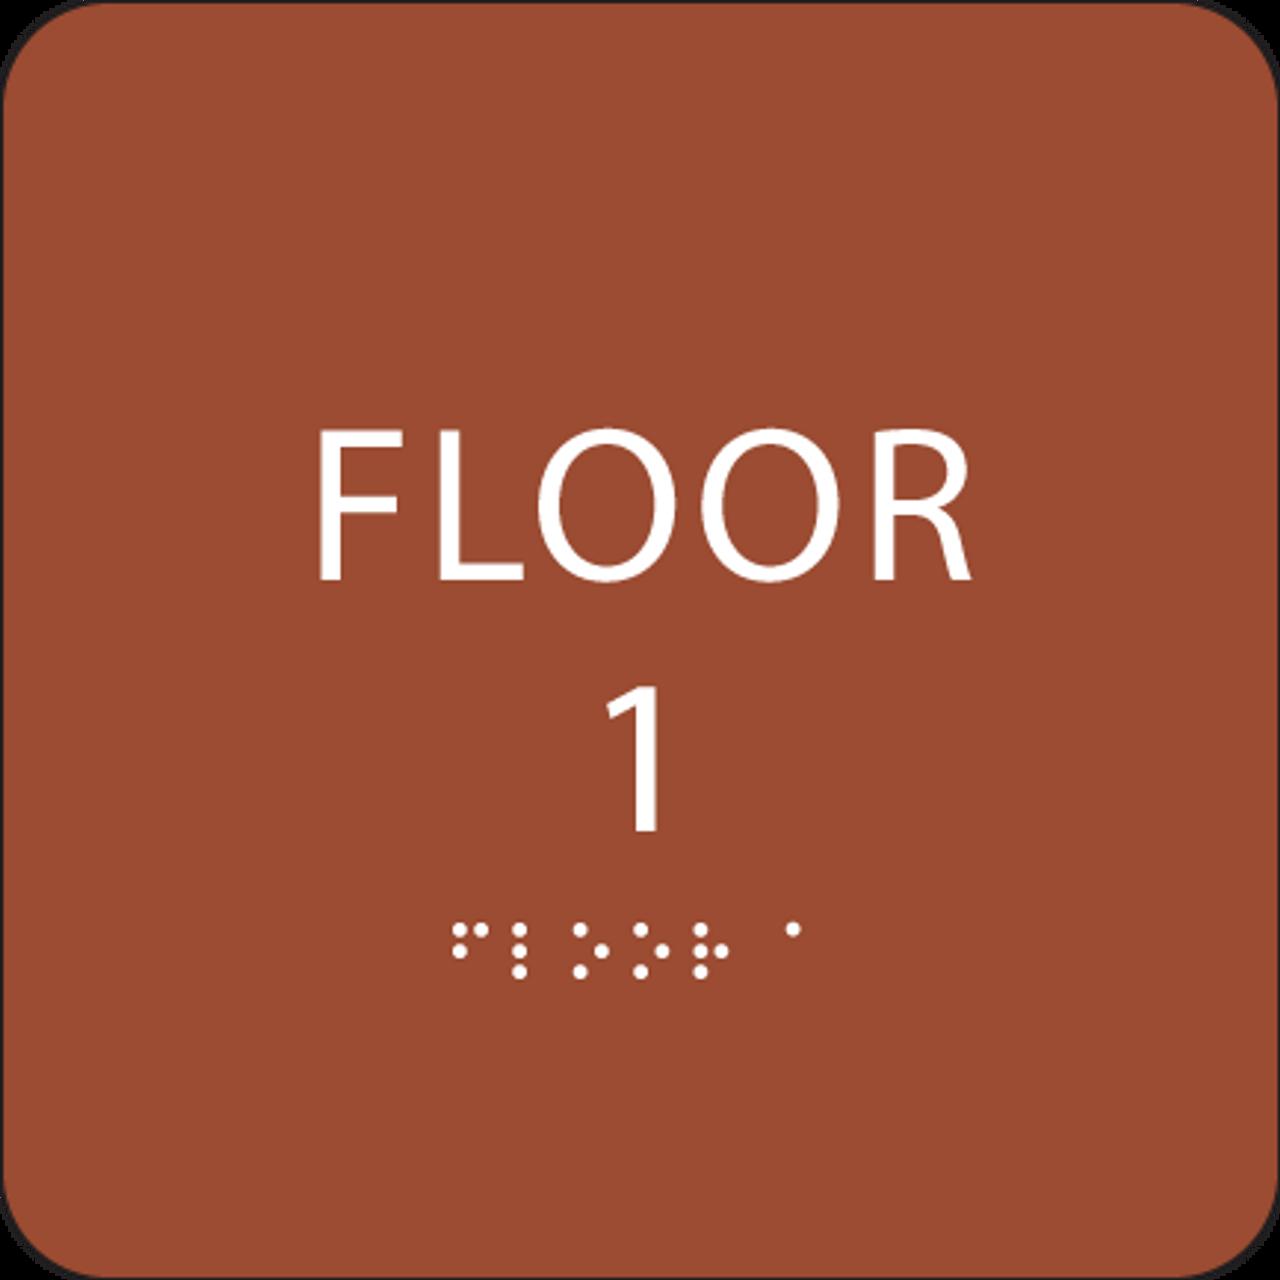 Orange Floor 1 Identification Sign